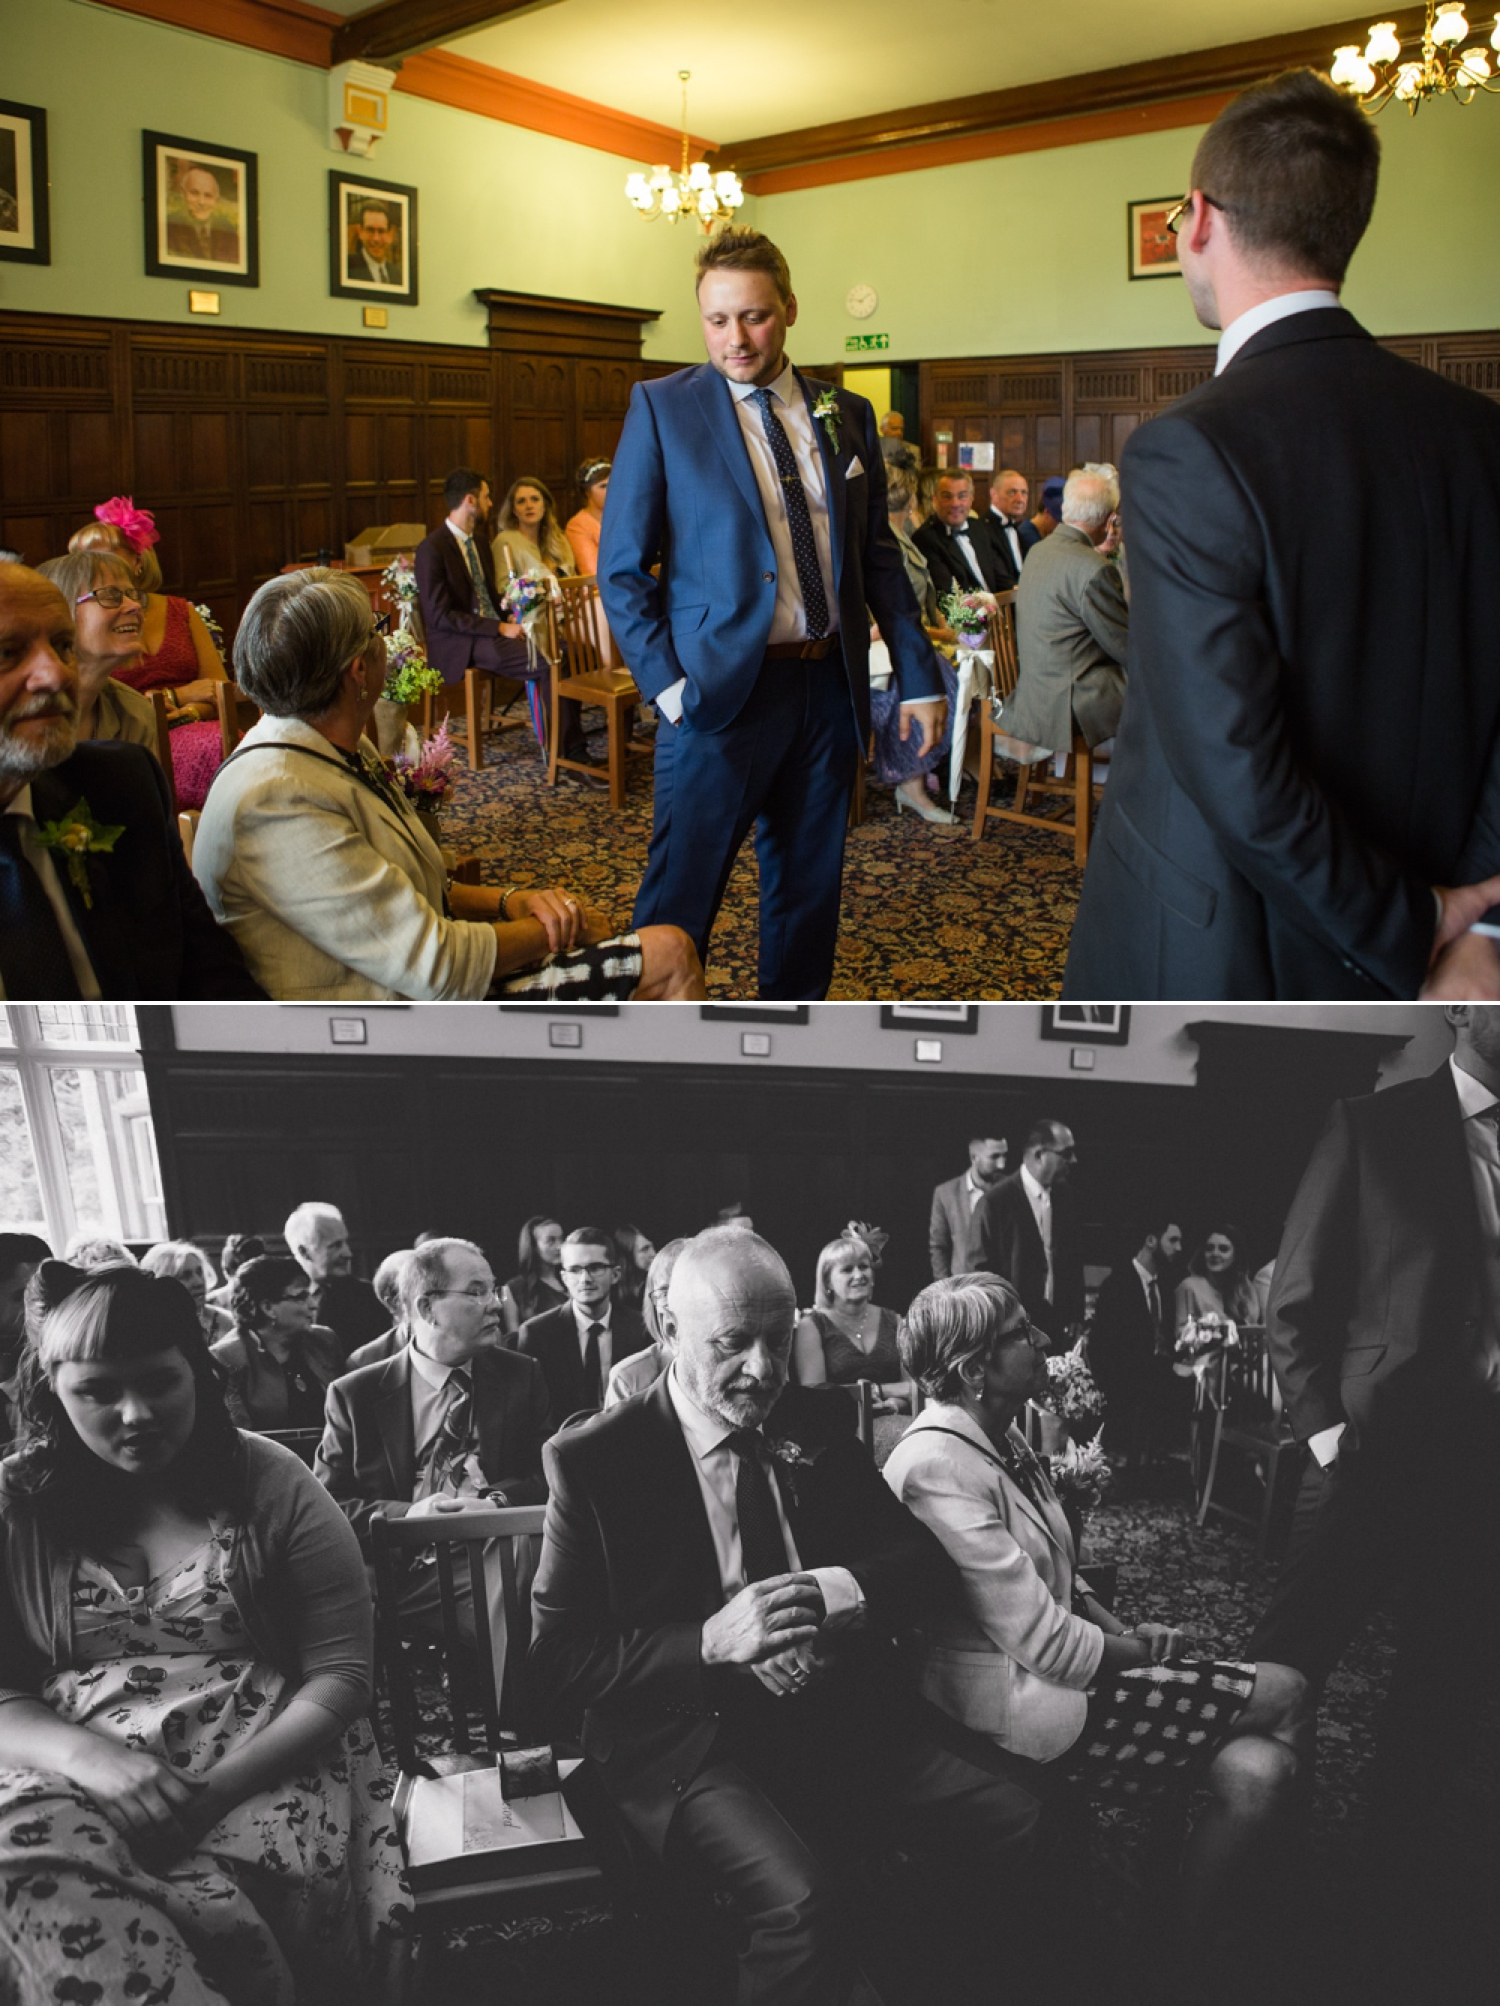 Somerset Wedding Photographer Elly & Liam 16